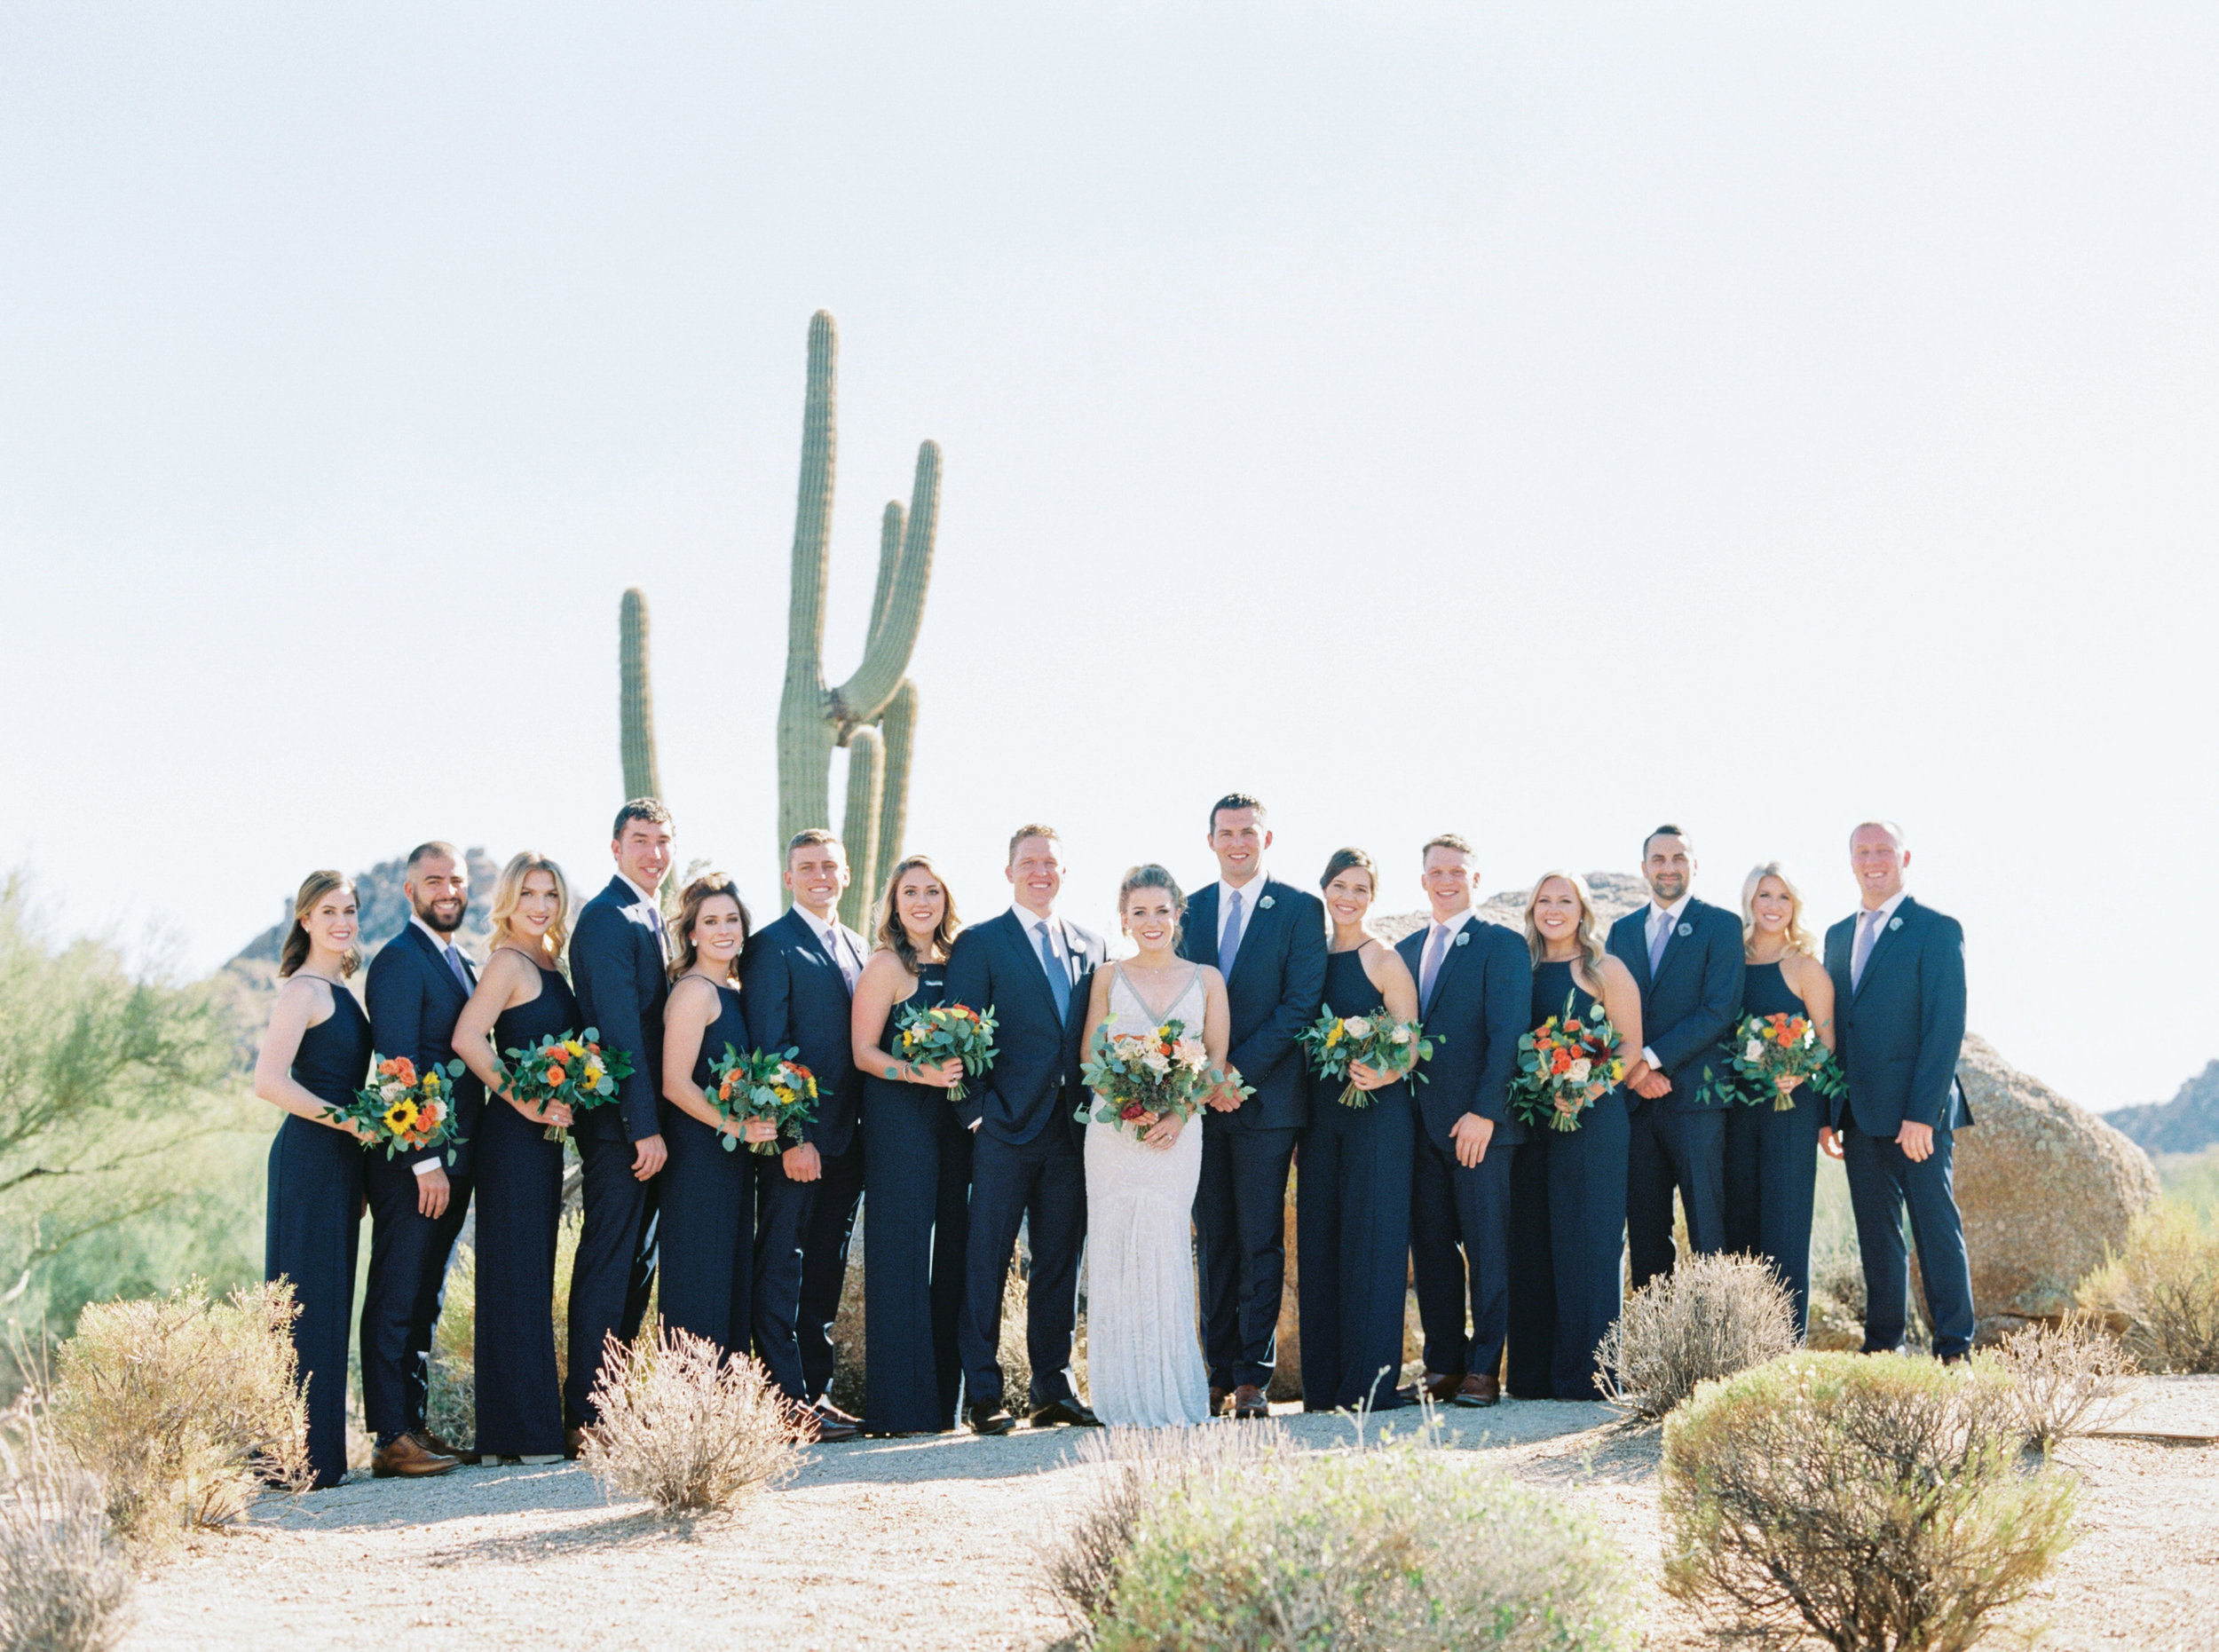 Troon North Desert Wedding - Navy Bridesmaids Dresses